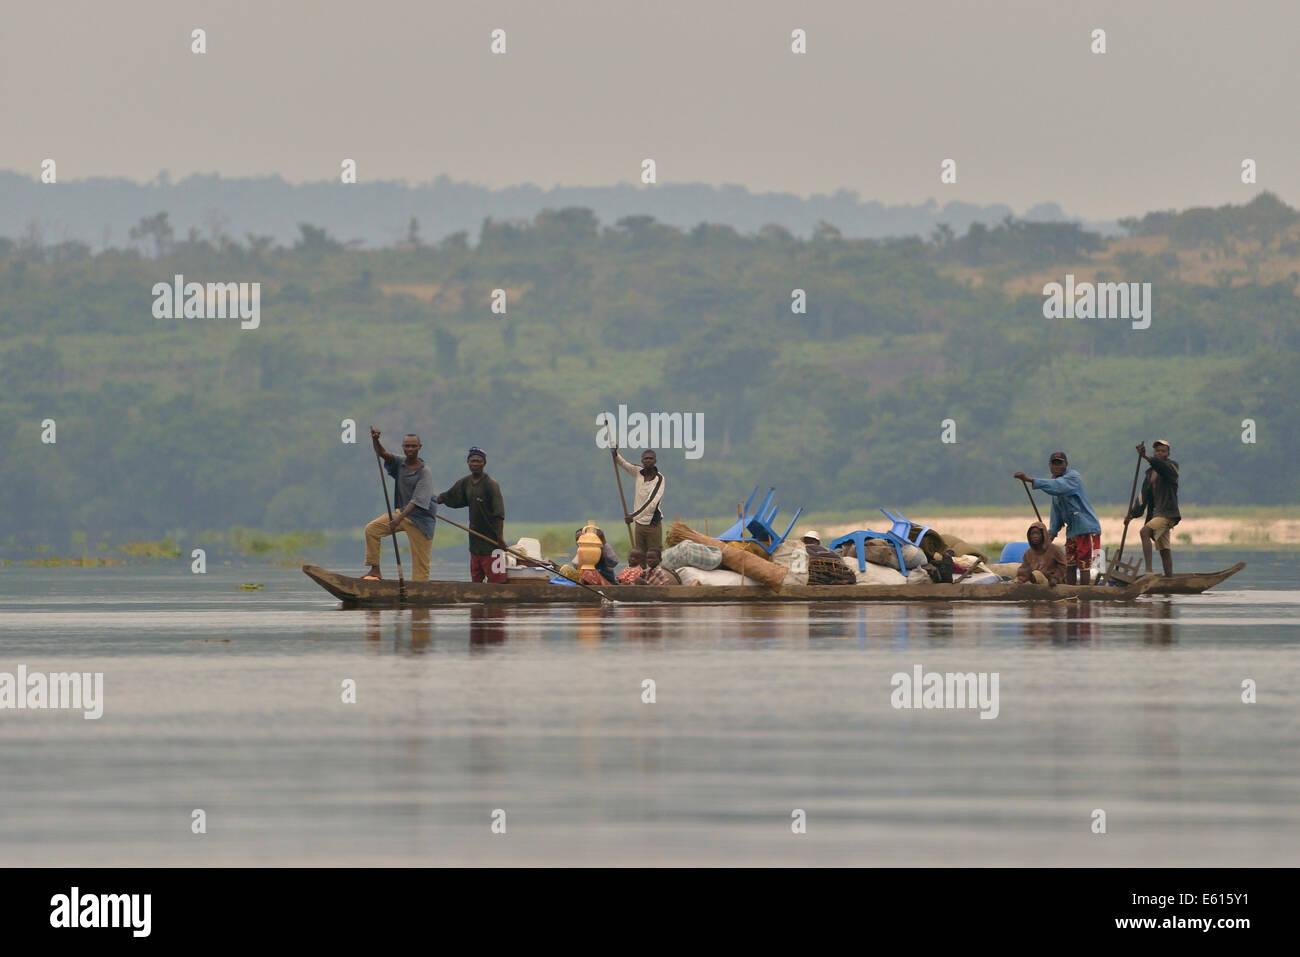 Fishermen on a pirogue on the Congo River, near Tshumbiri, Bandundu Province, Democratic Republic of the Congo - Stock Image